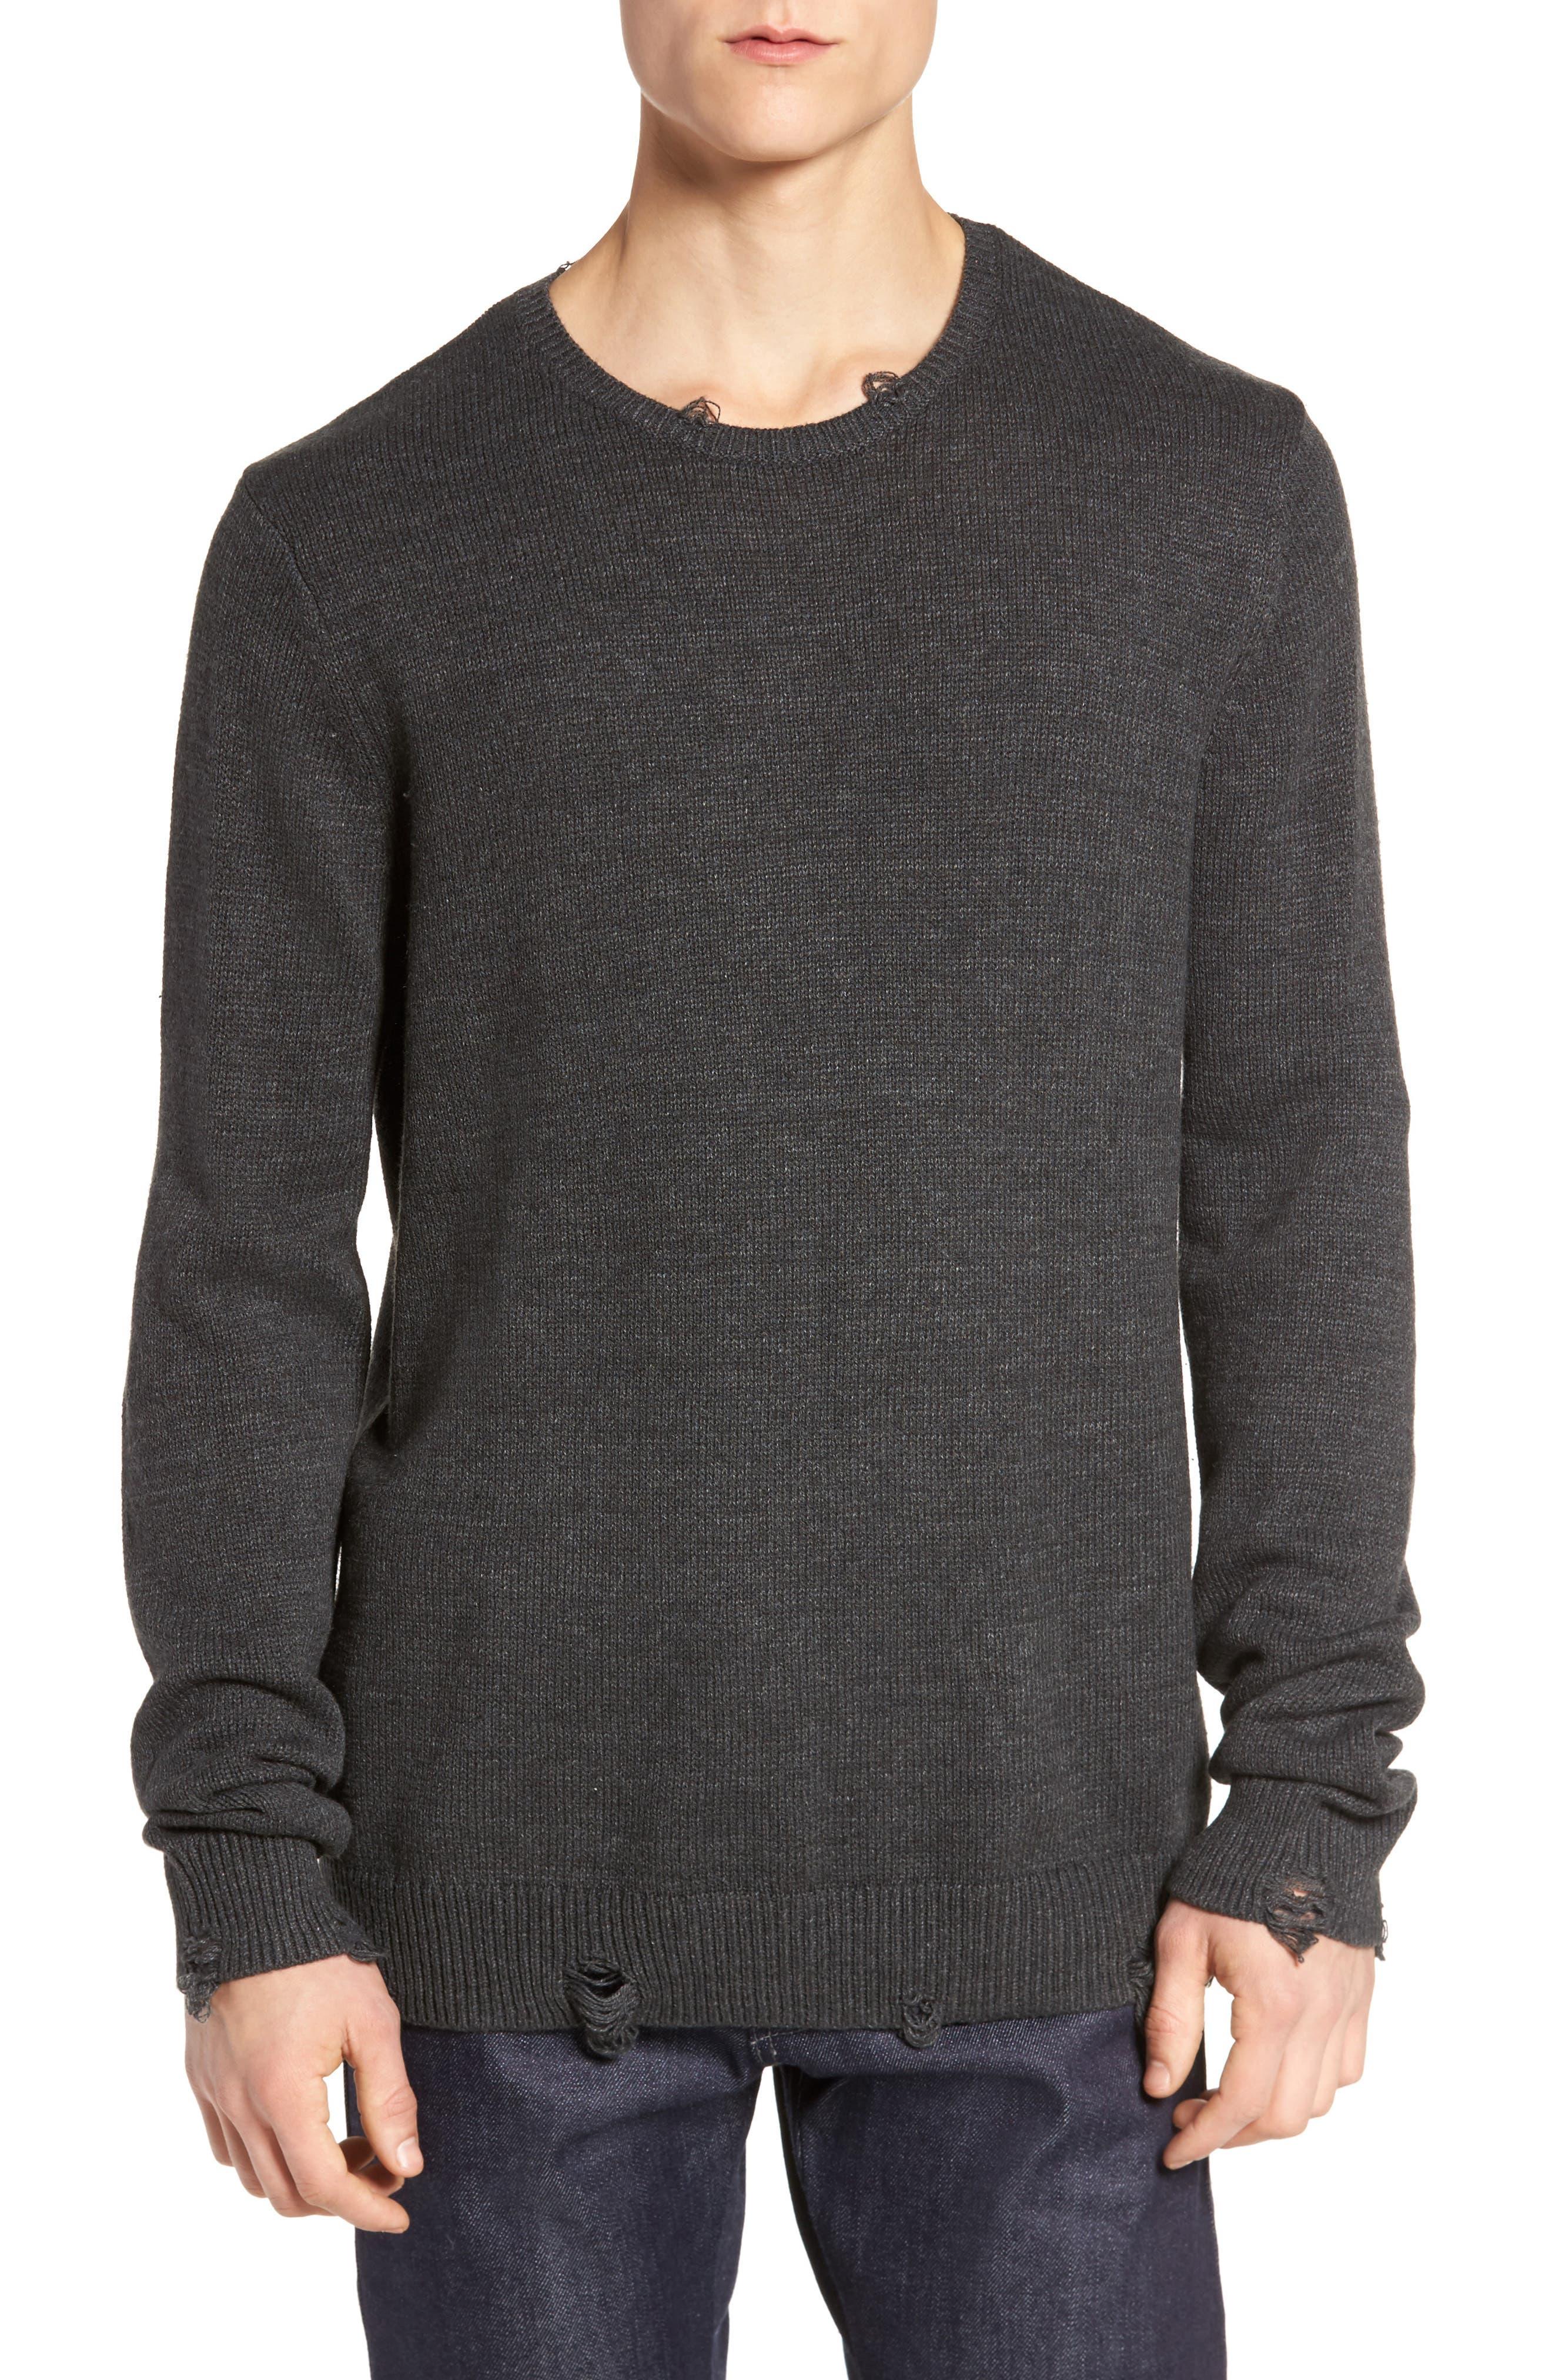 The Rail Destroyed Crewneck Sweater